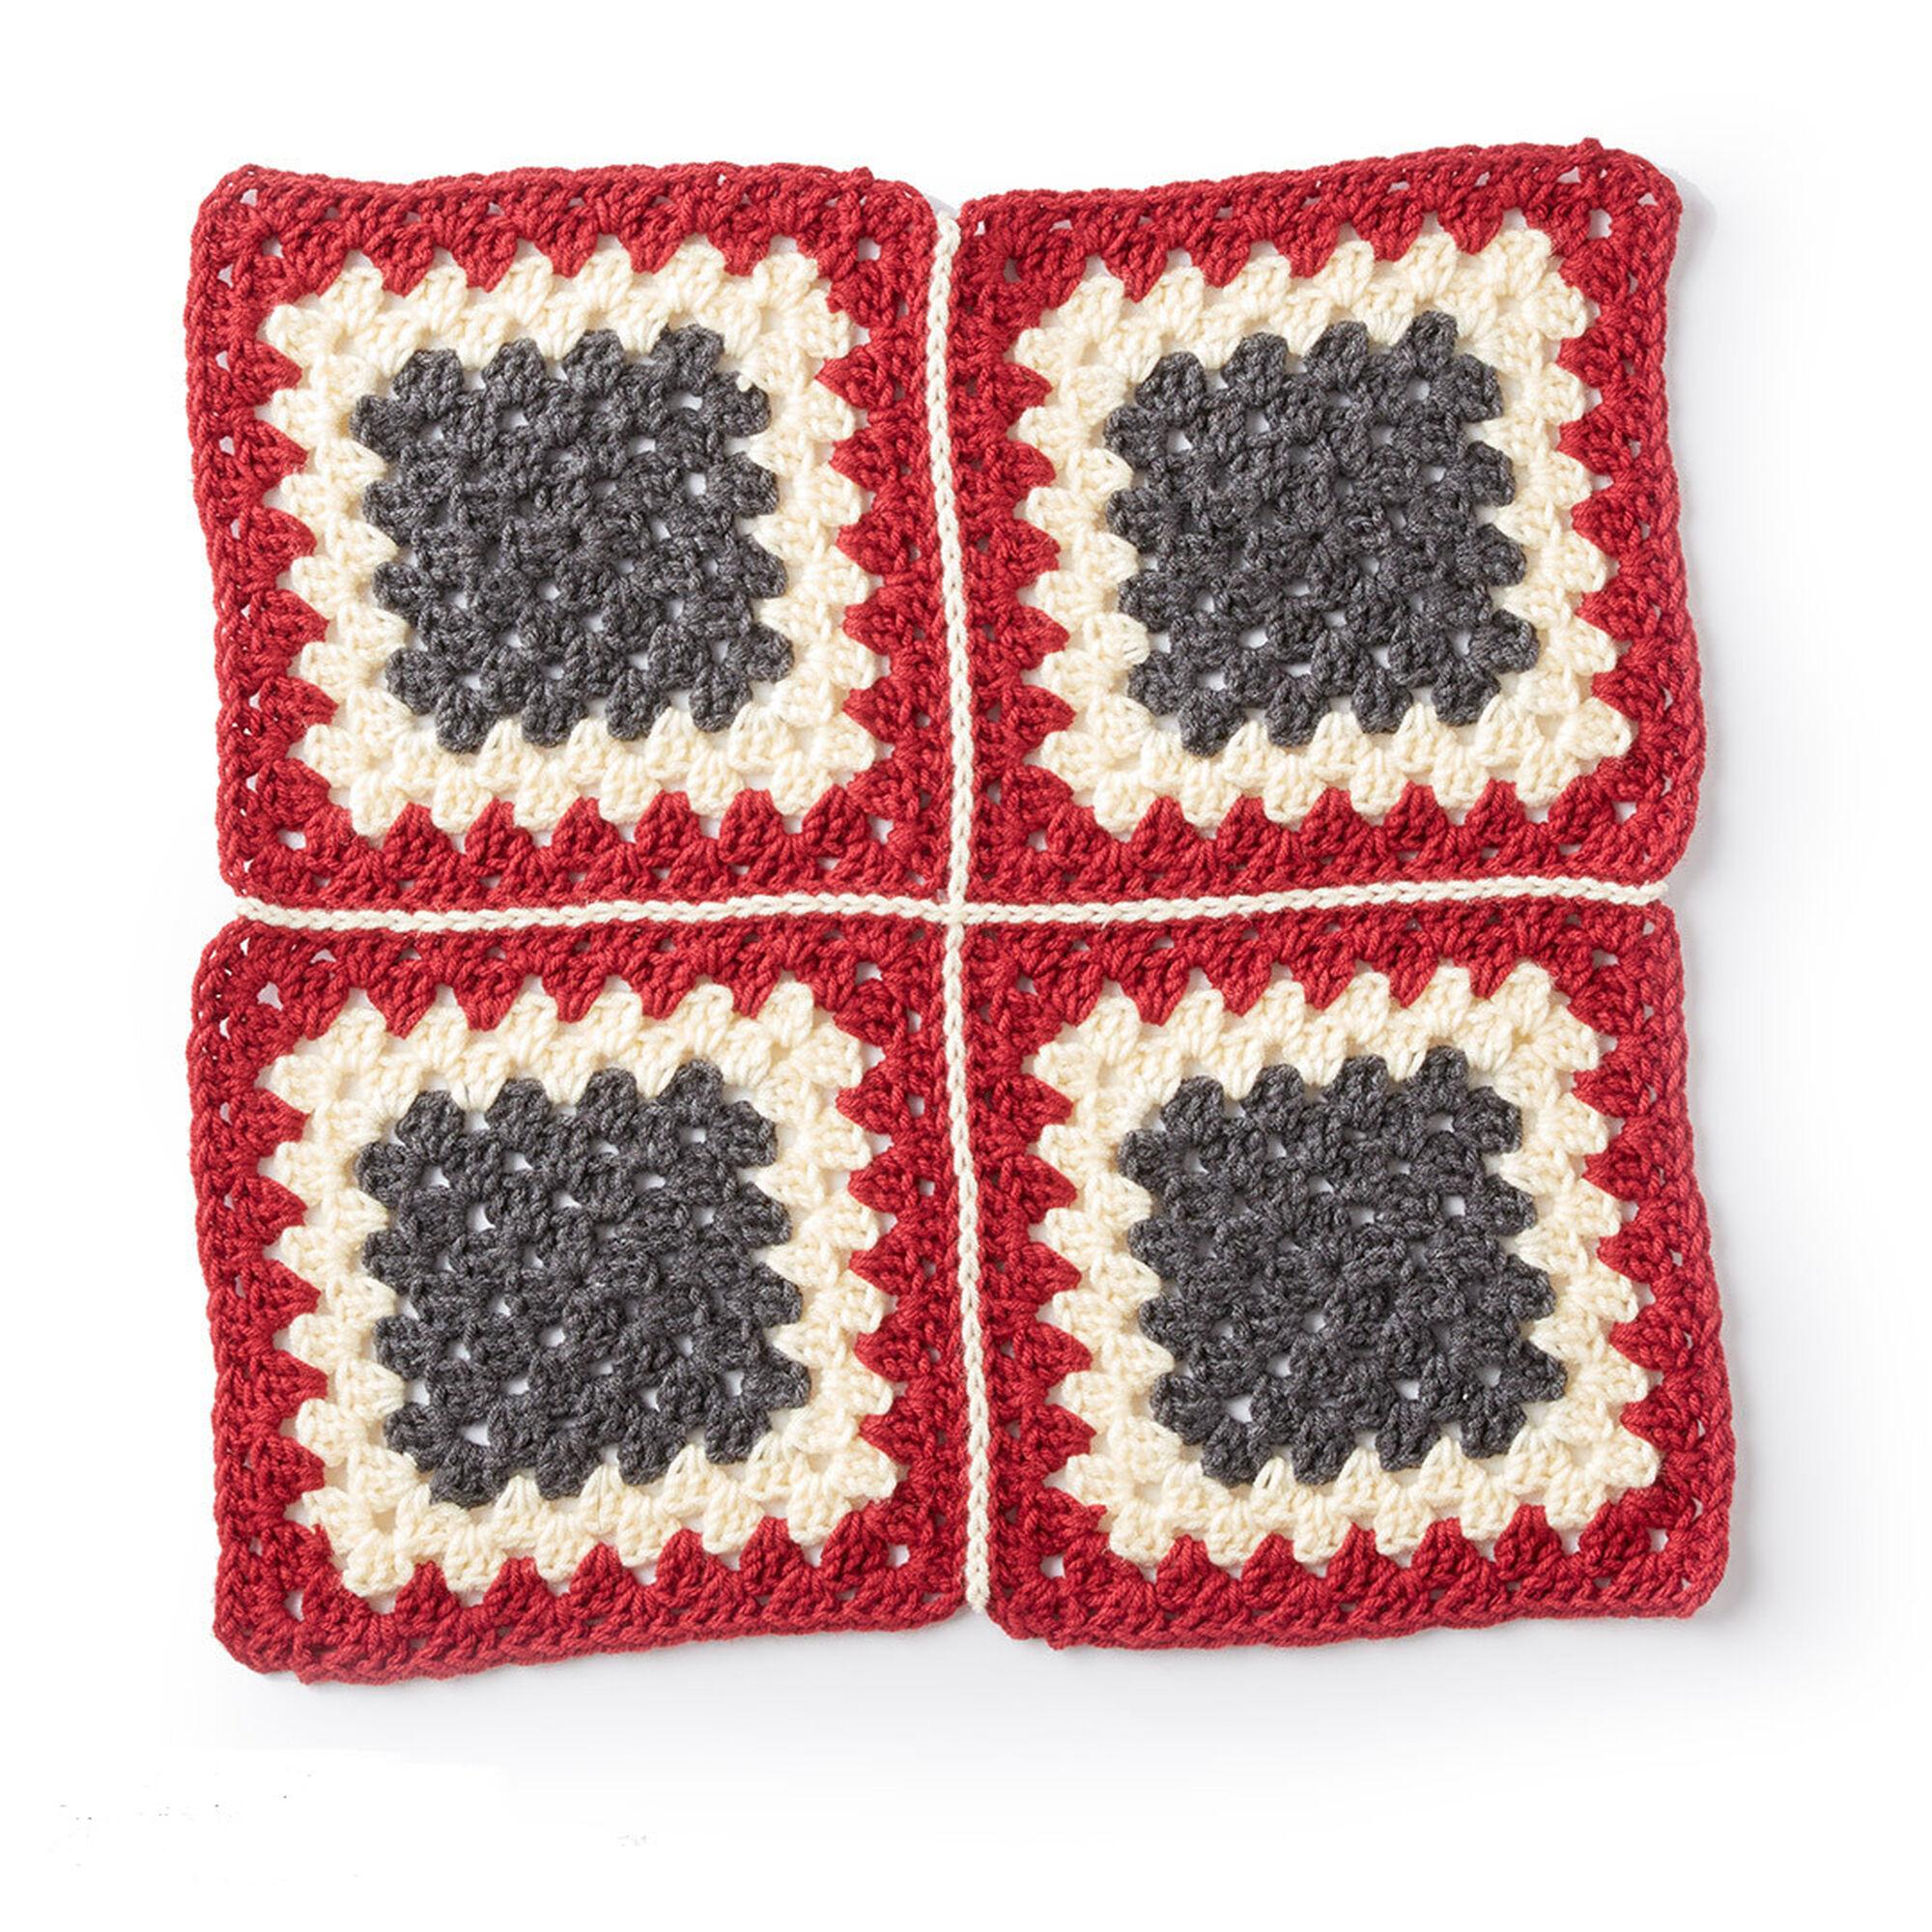 Caron Diamond Crochet Granny Afghan, Version 1 | Yarnspirations